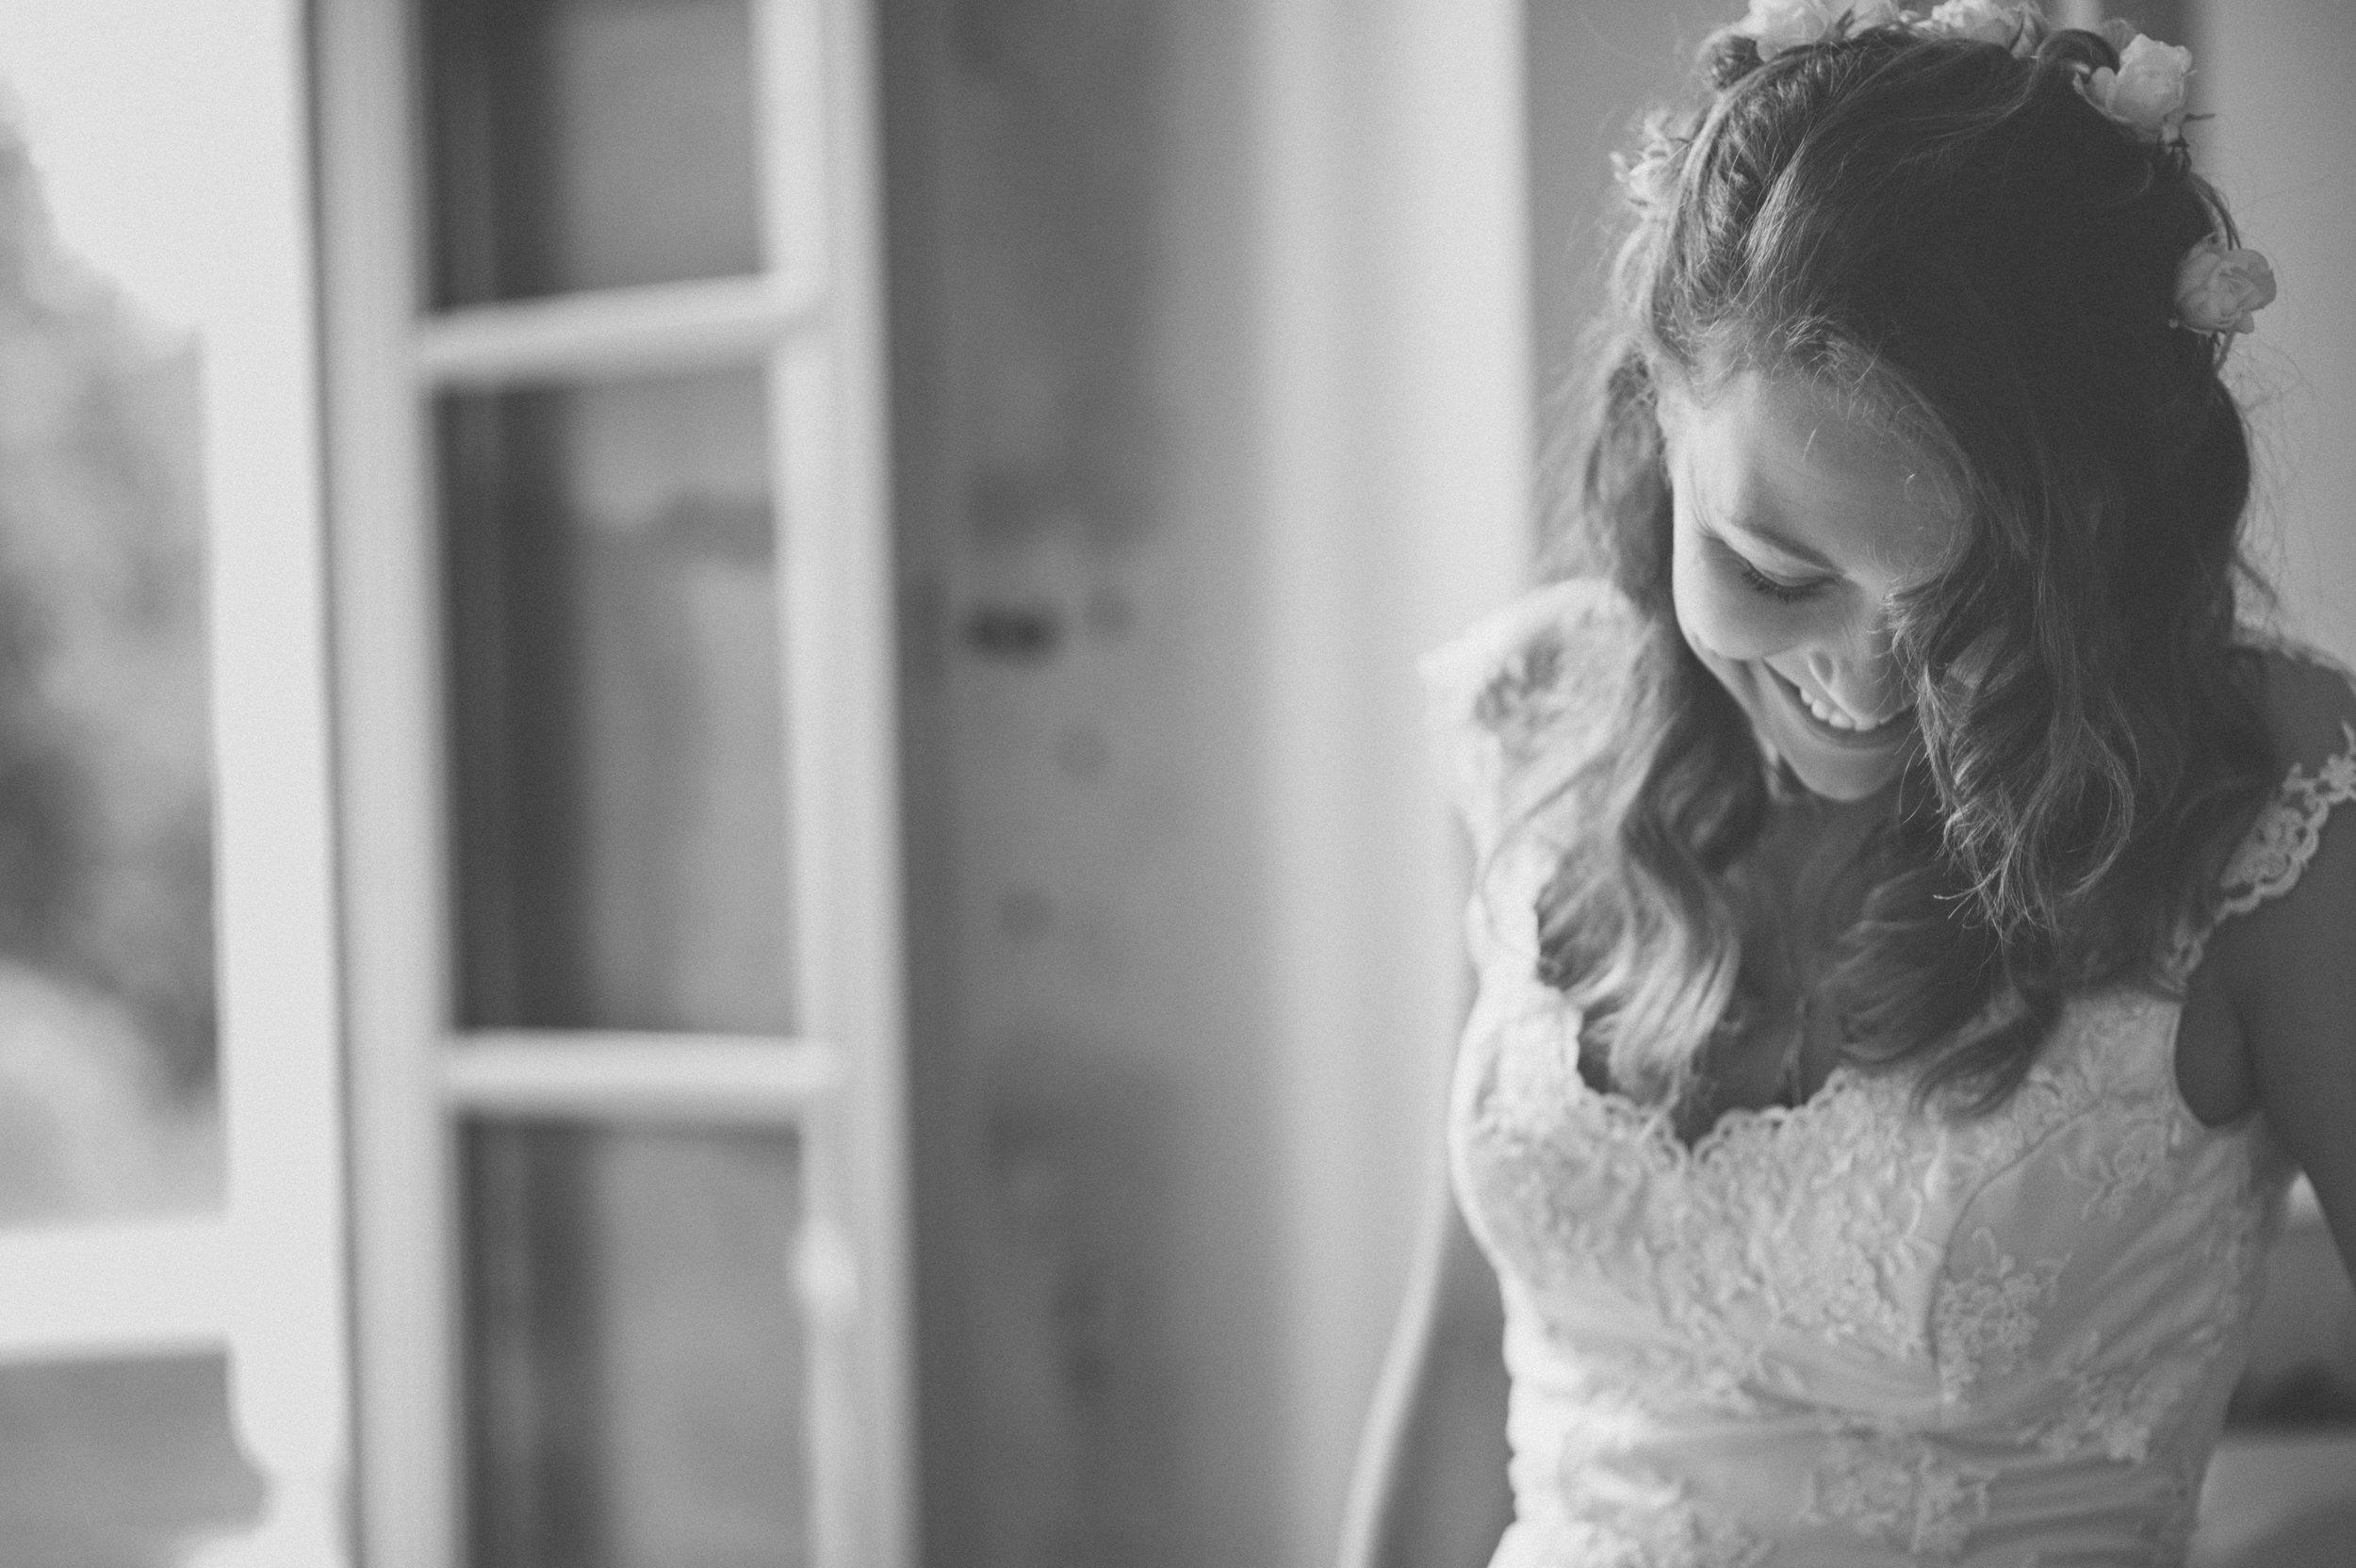 dordogne-wedding-photographer-mark-shaw-6.jpg